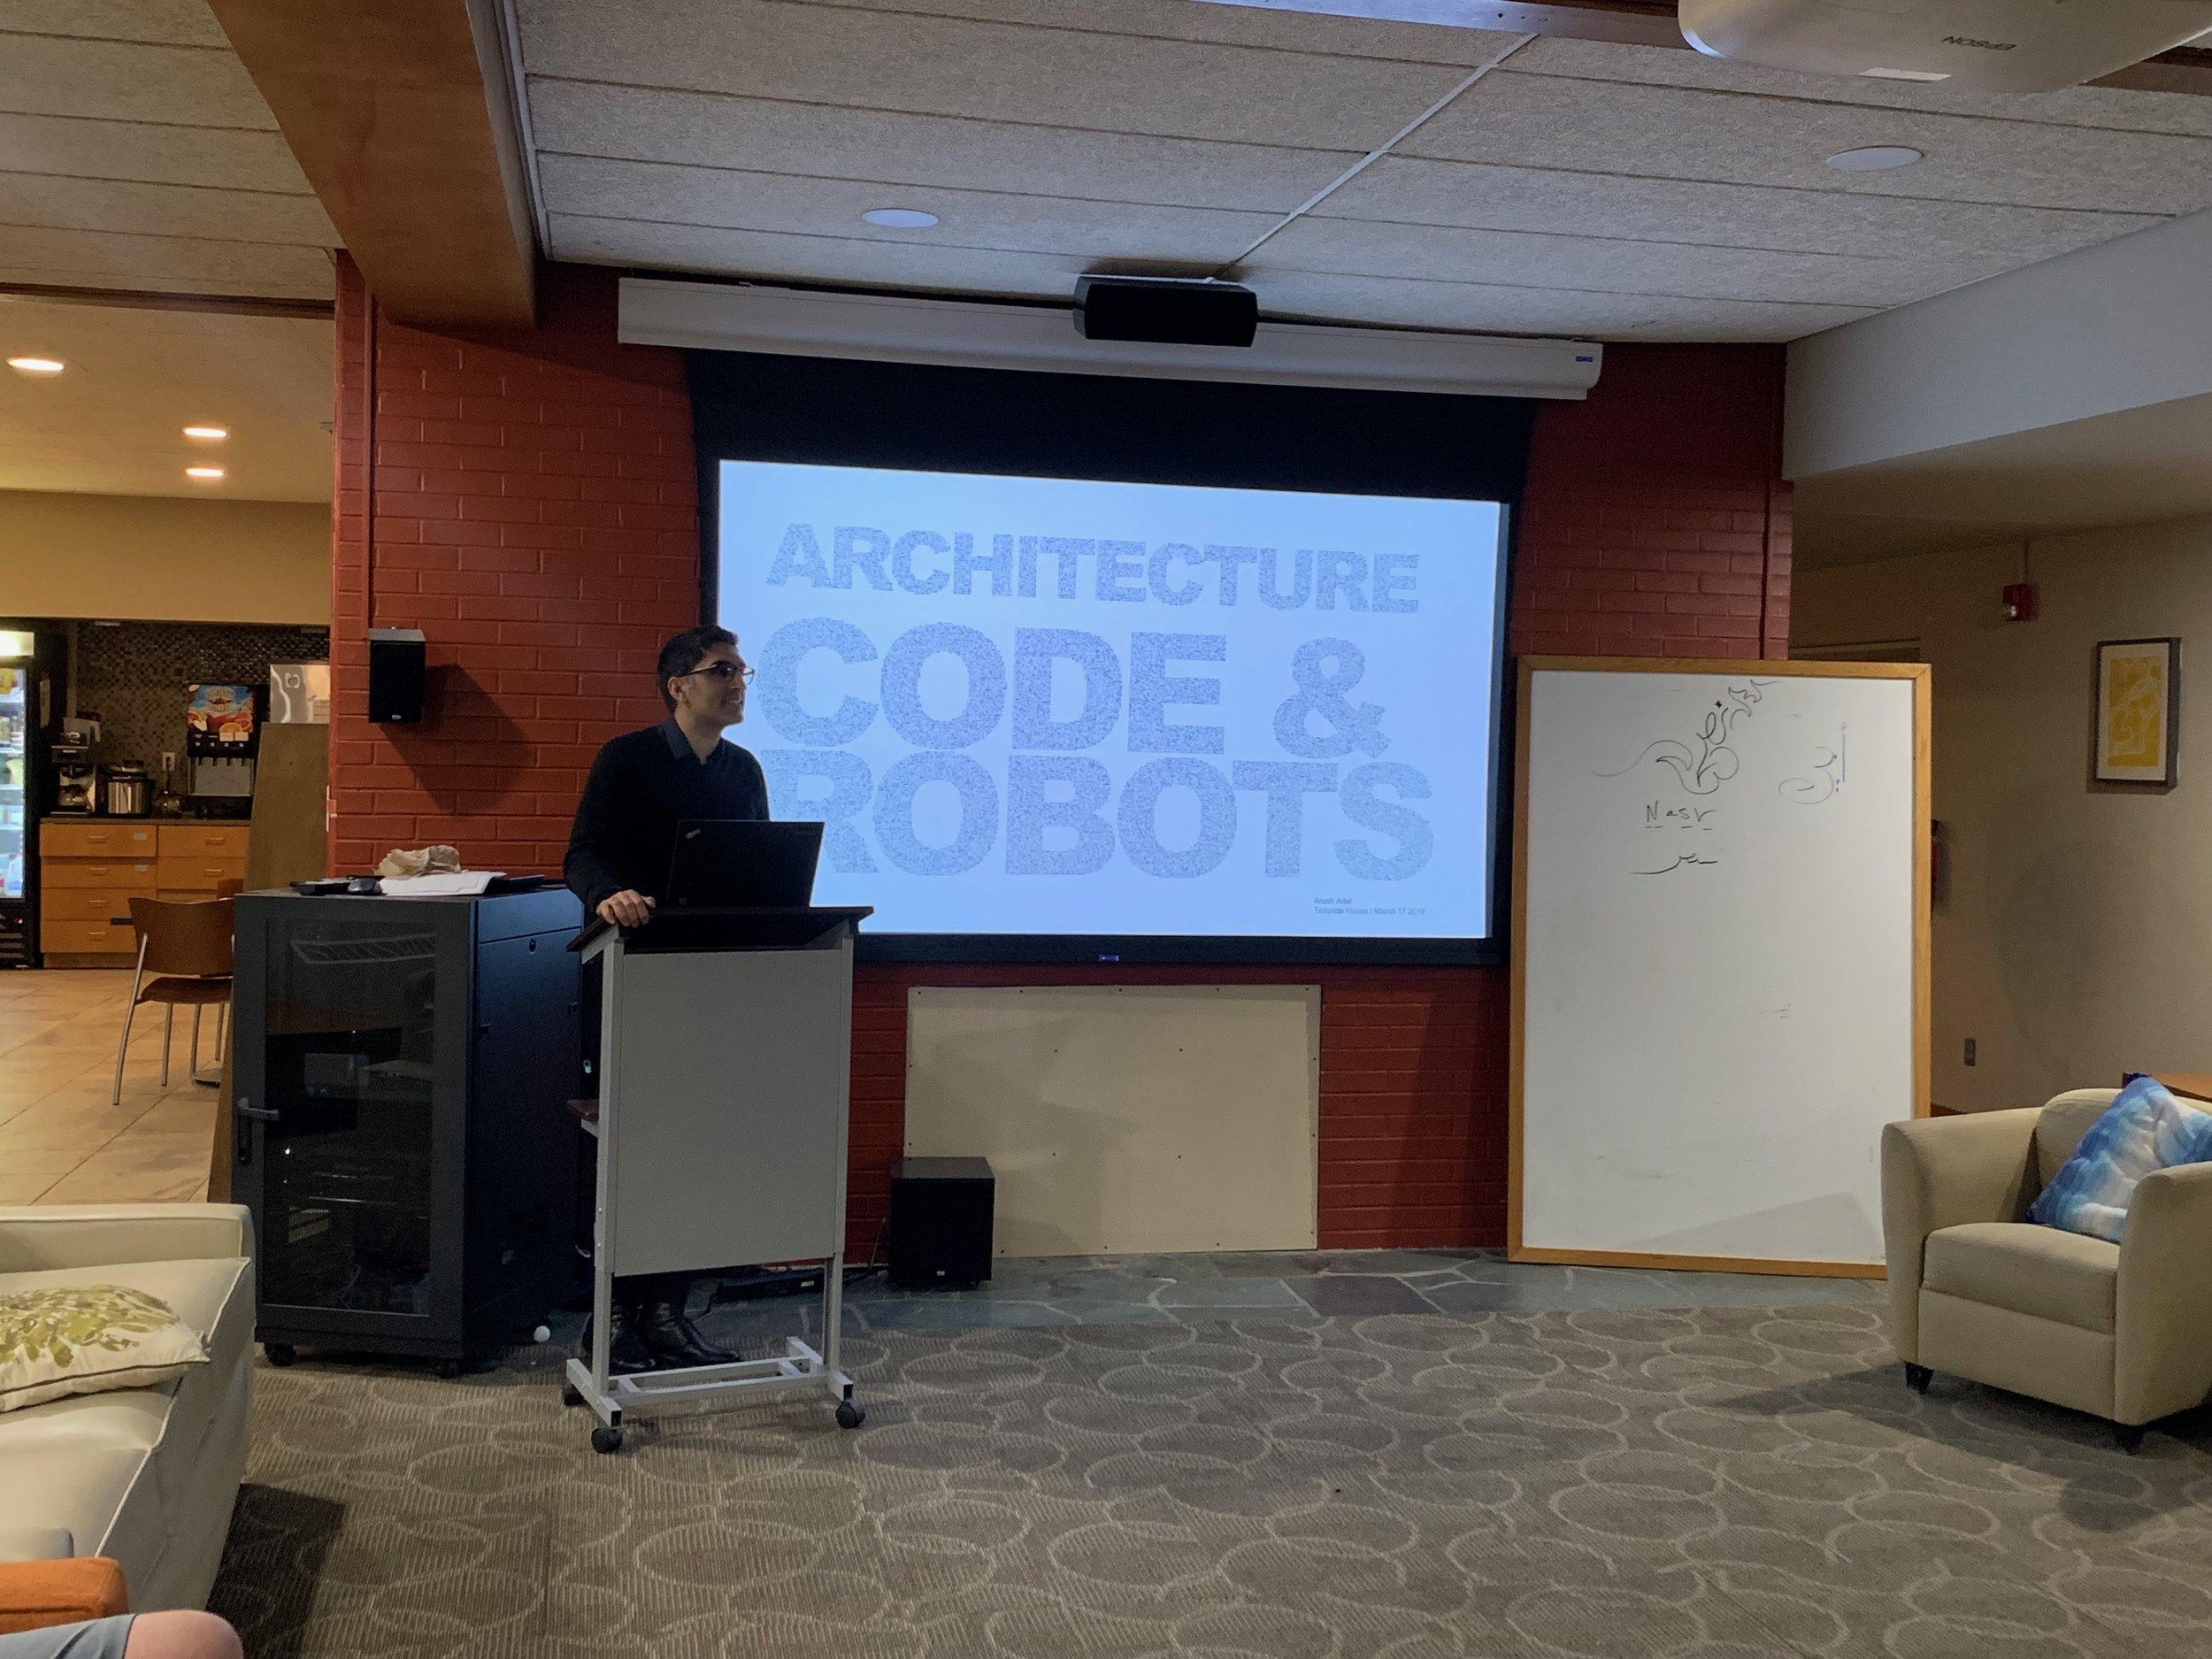 Architecture, Code & Robots